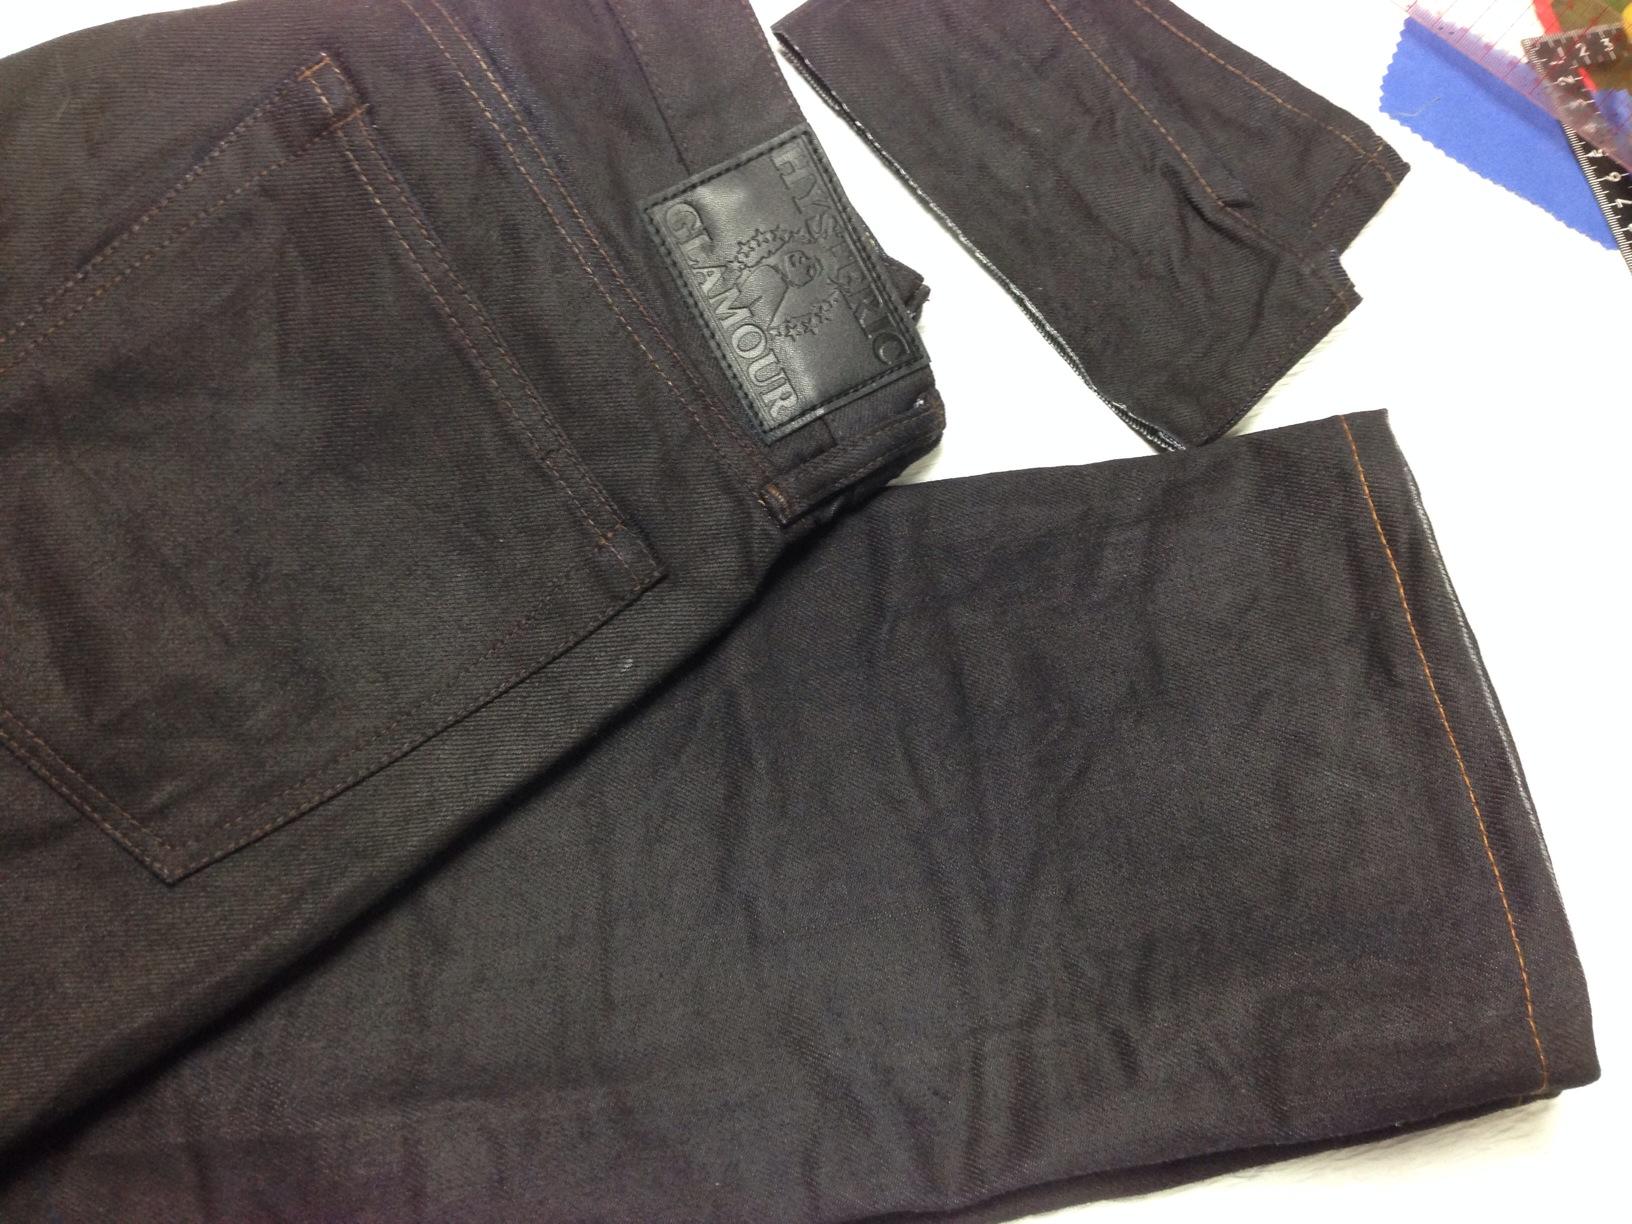 HYSTERIC GLAMOUR(ヒステリック グラマー)ジーンズ裾上げ